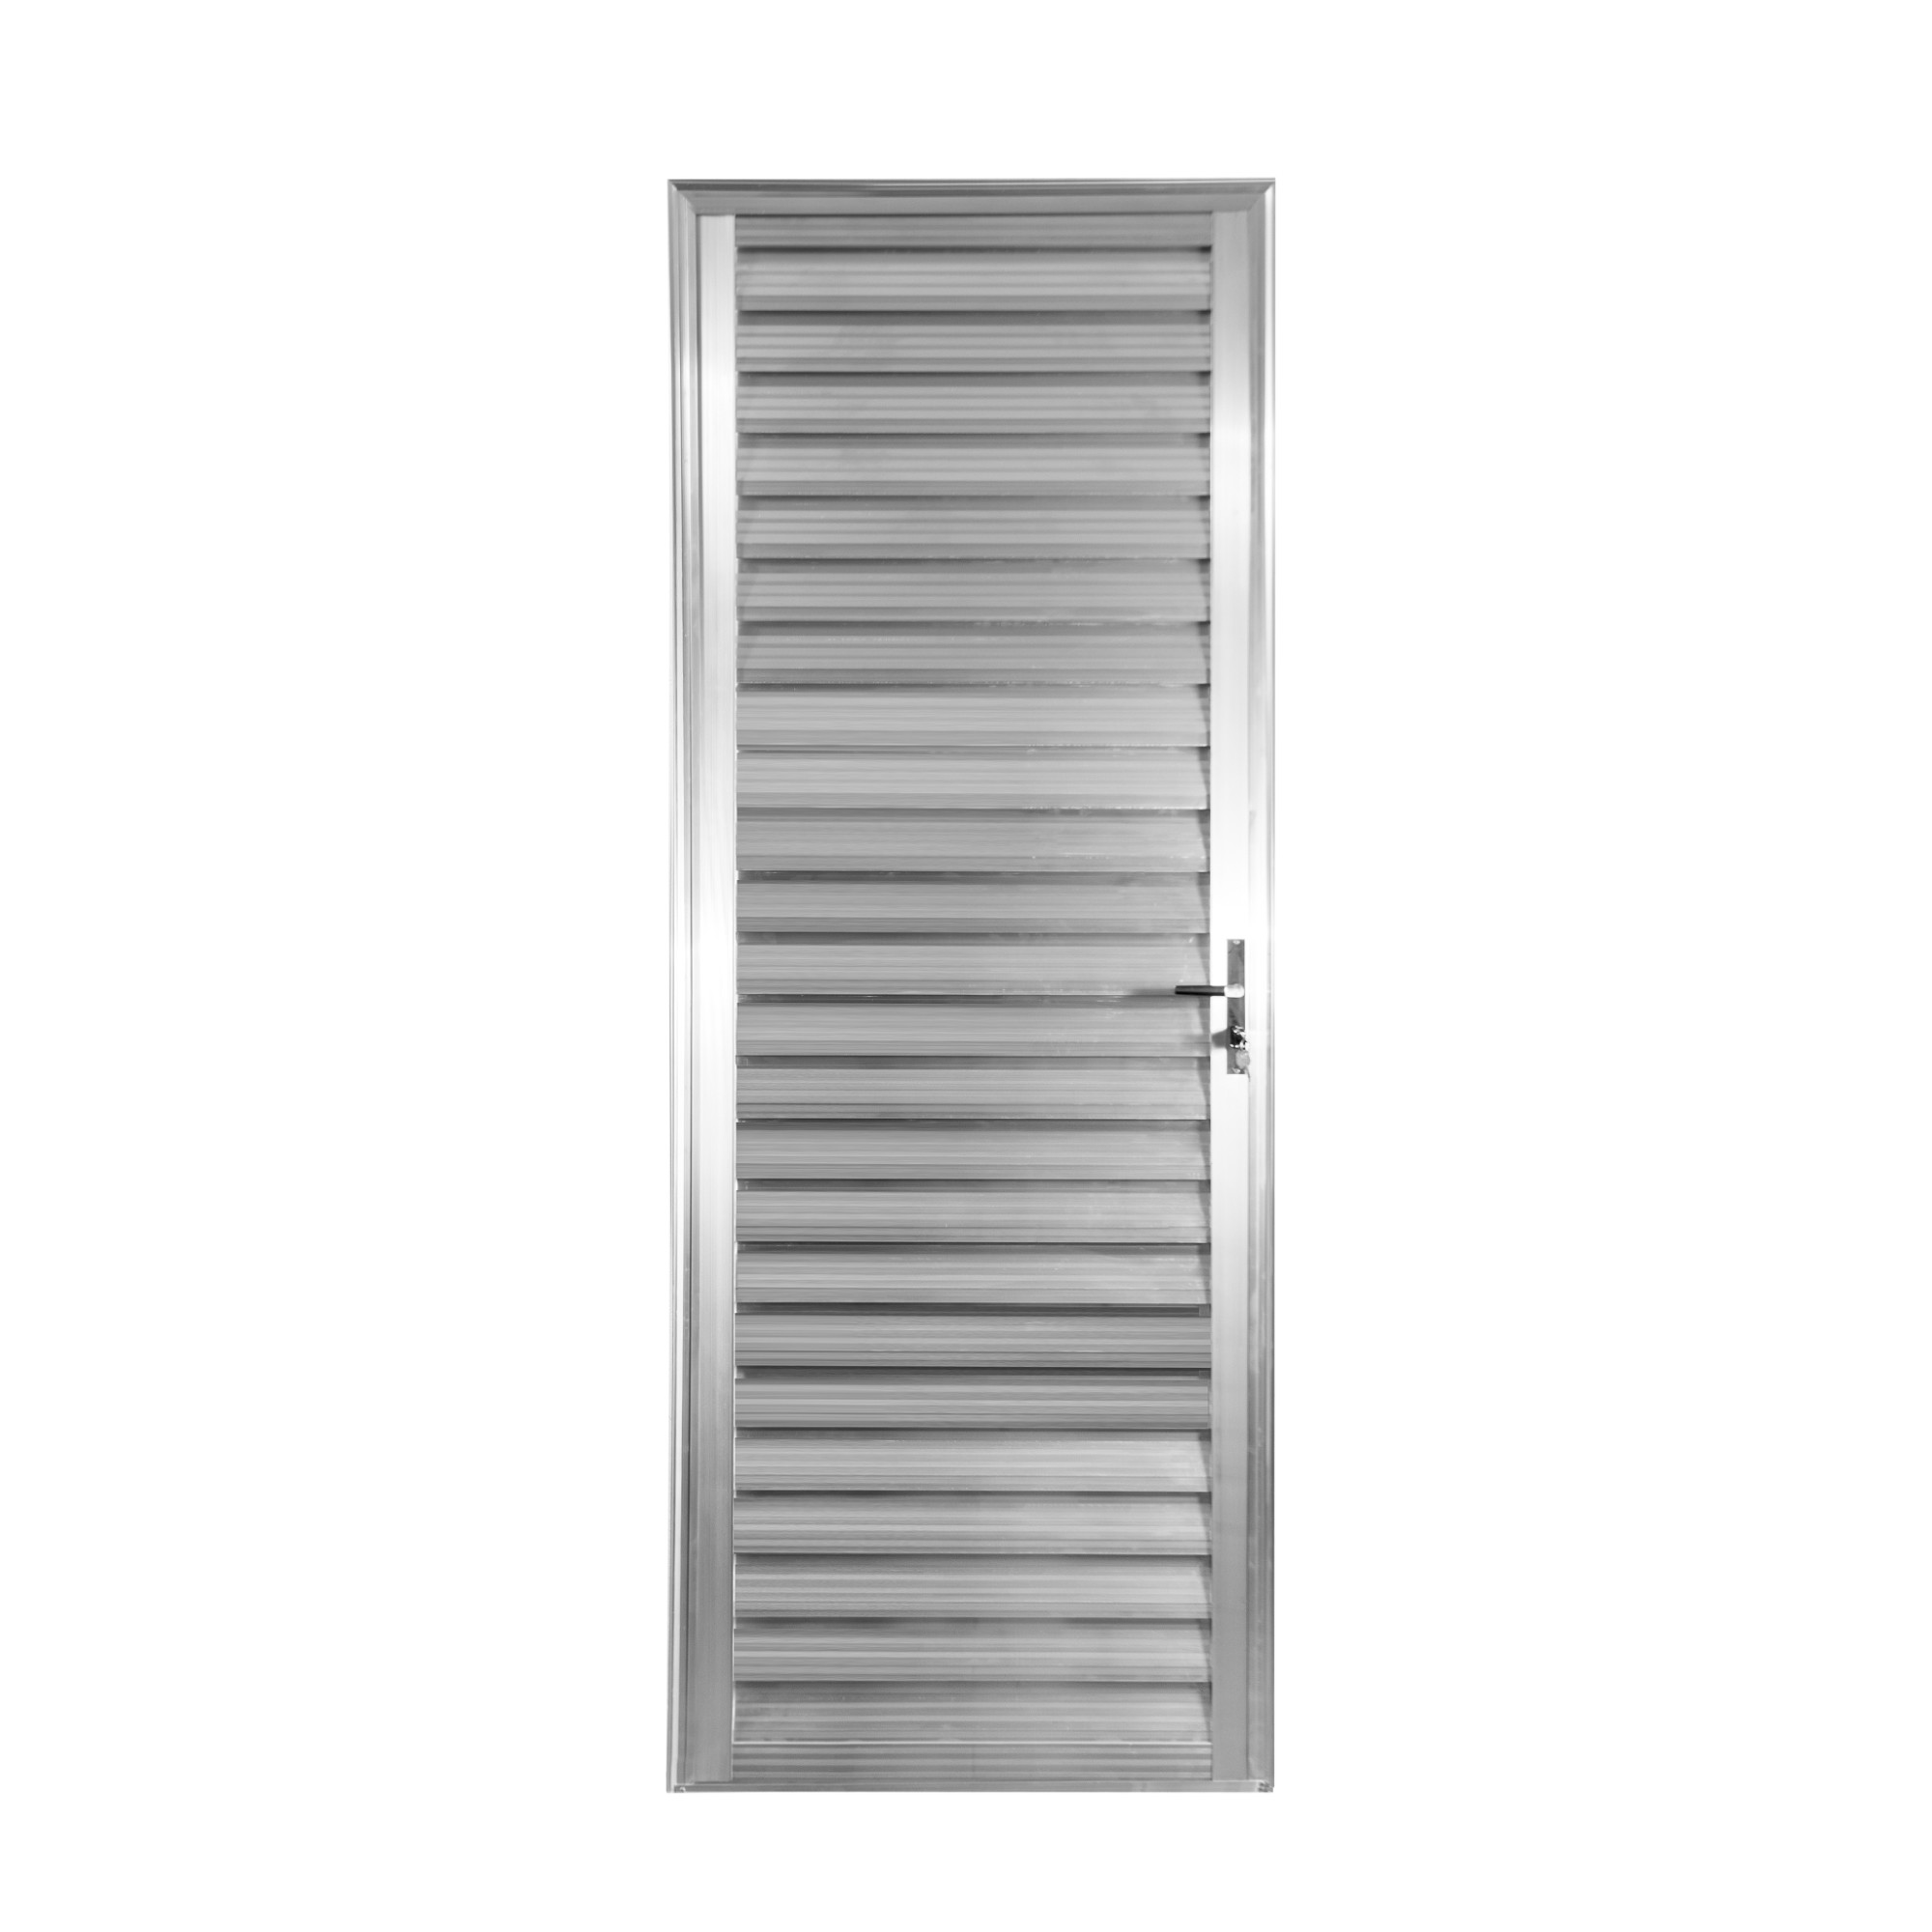 Porta de Abrir de Aluminio 210cm x 80cm Veneziana Lado Esquerdo - Aluvid